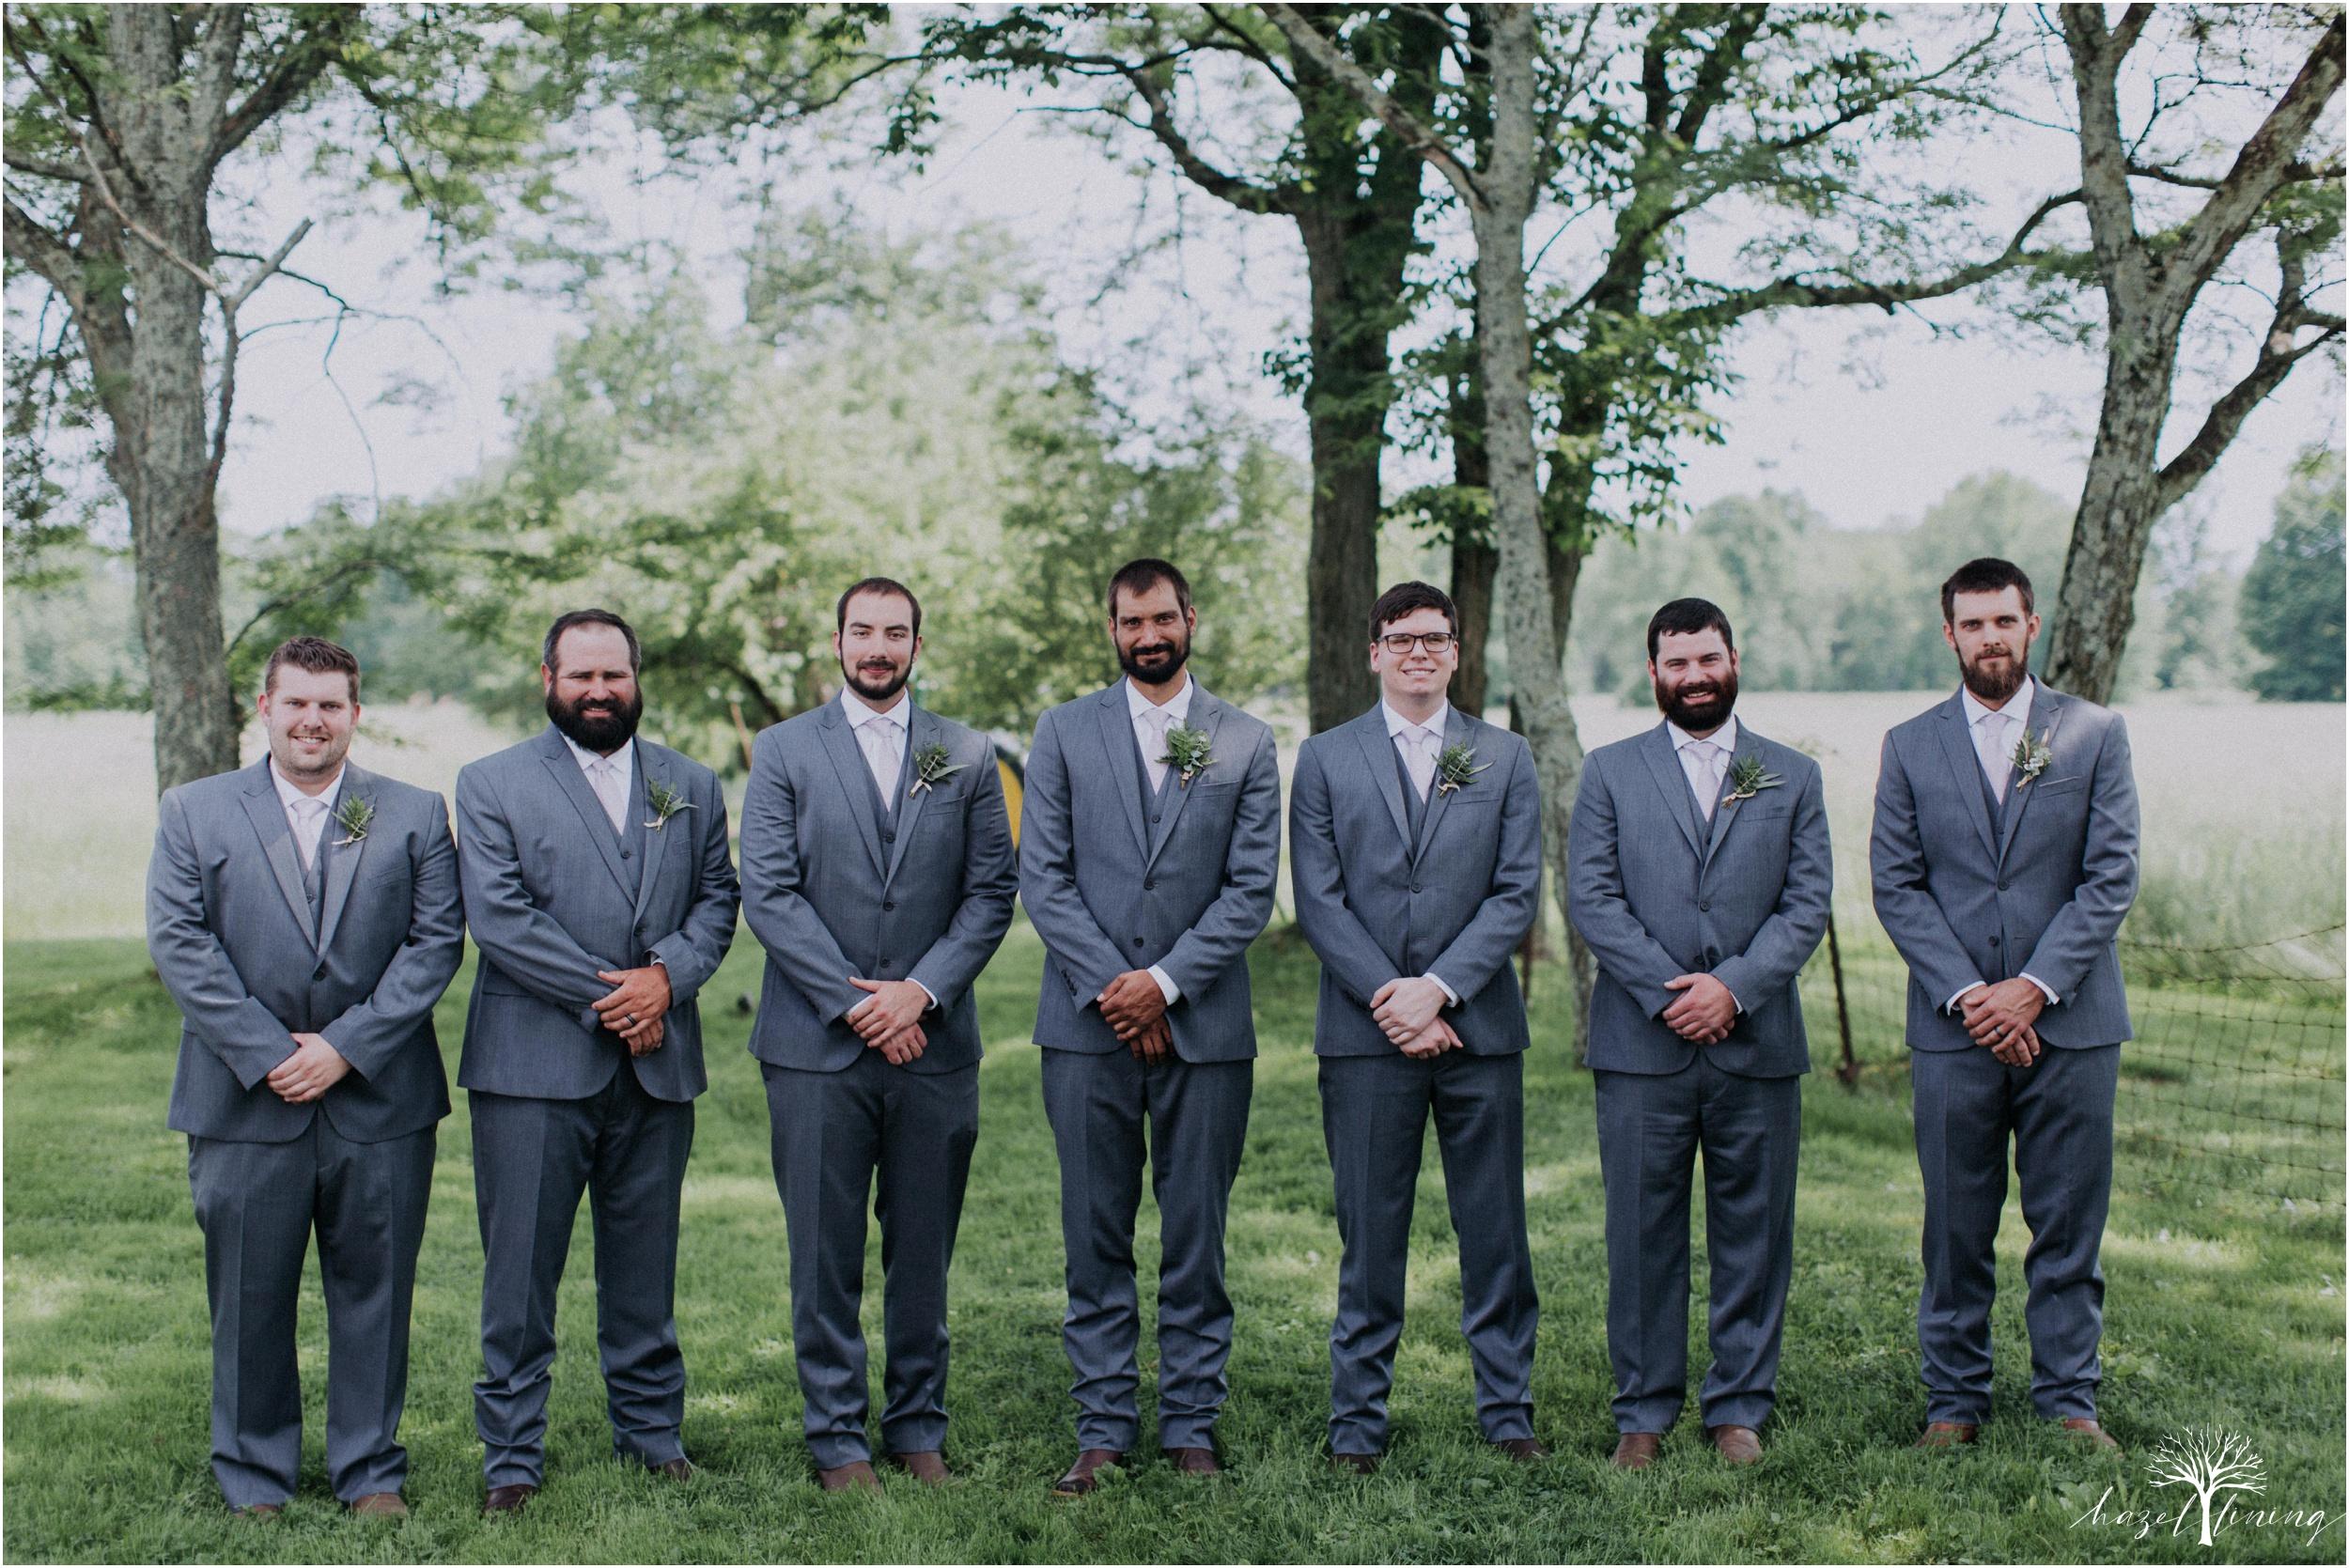 hazel-lining-travel-wedding-elopement-photography-lisa-landon-shoemaker-the-farm-bakery-and-events-bucks-county-quakertown-pennsylvania-summer-country-outdoor-farm-wedding_0041.jpg